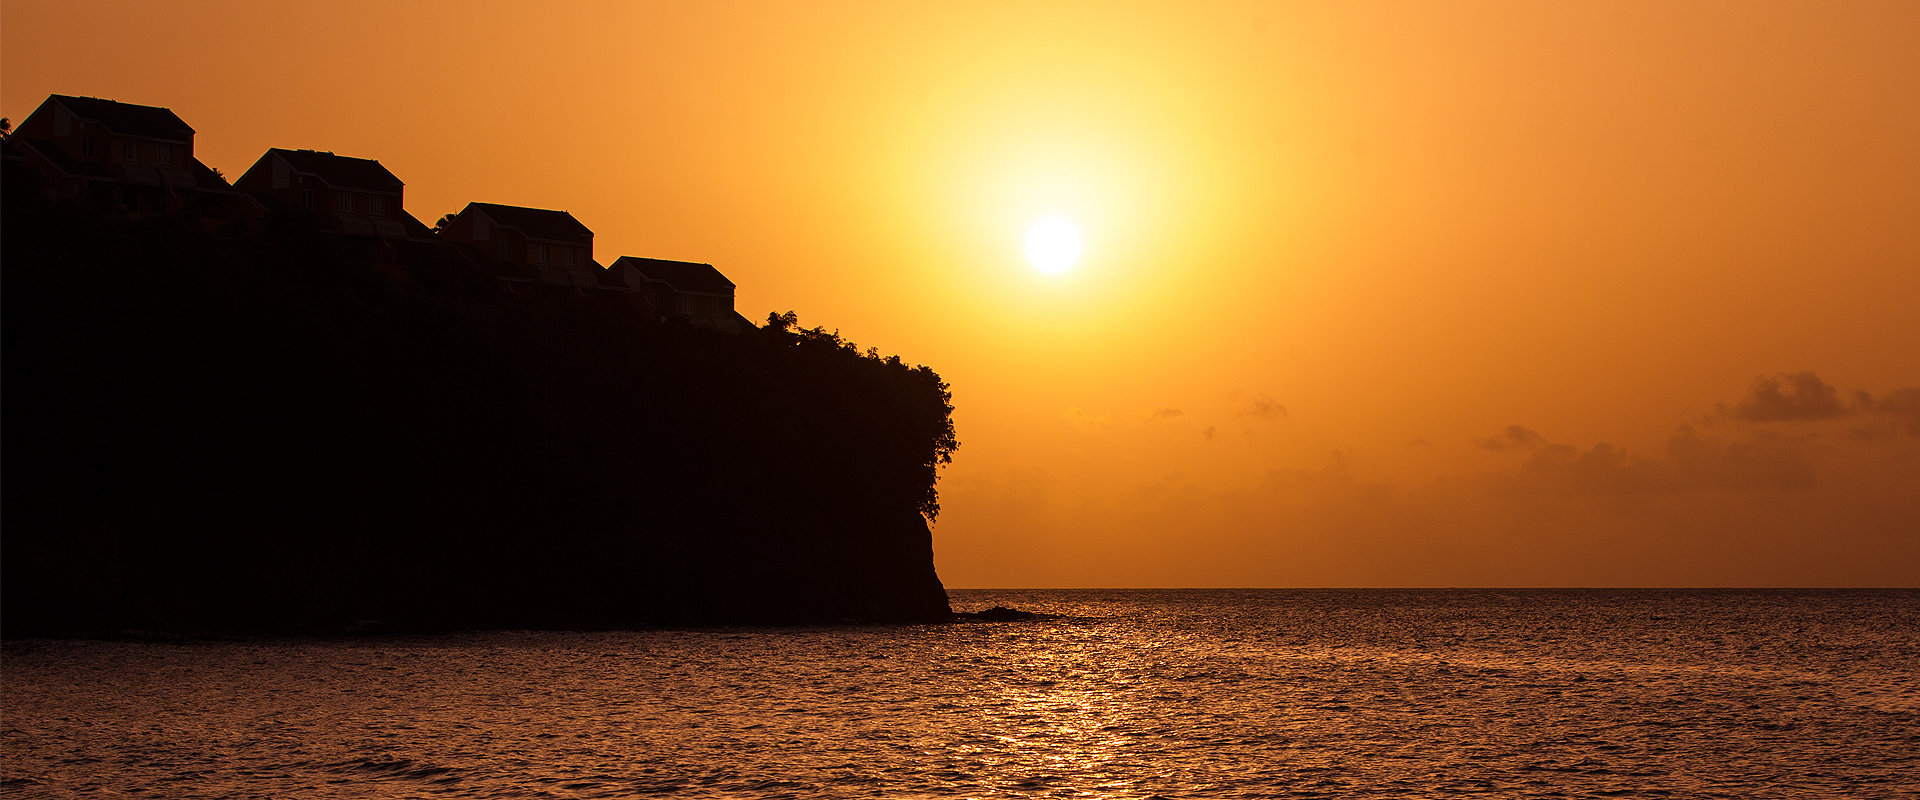 Dipali + Adam | pigeon island, Saint Lucia | Sandals Regency La Toc